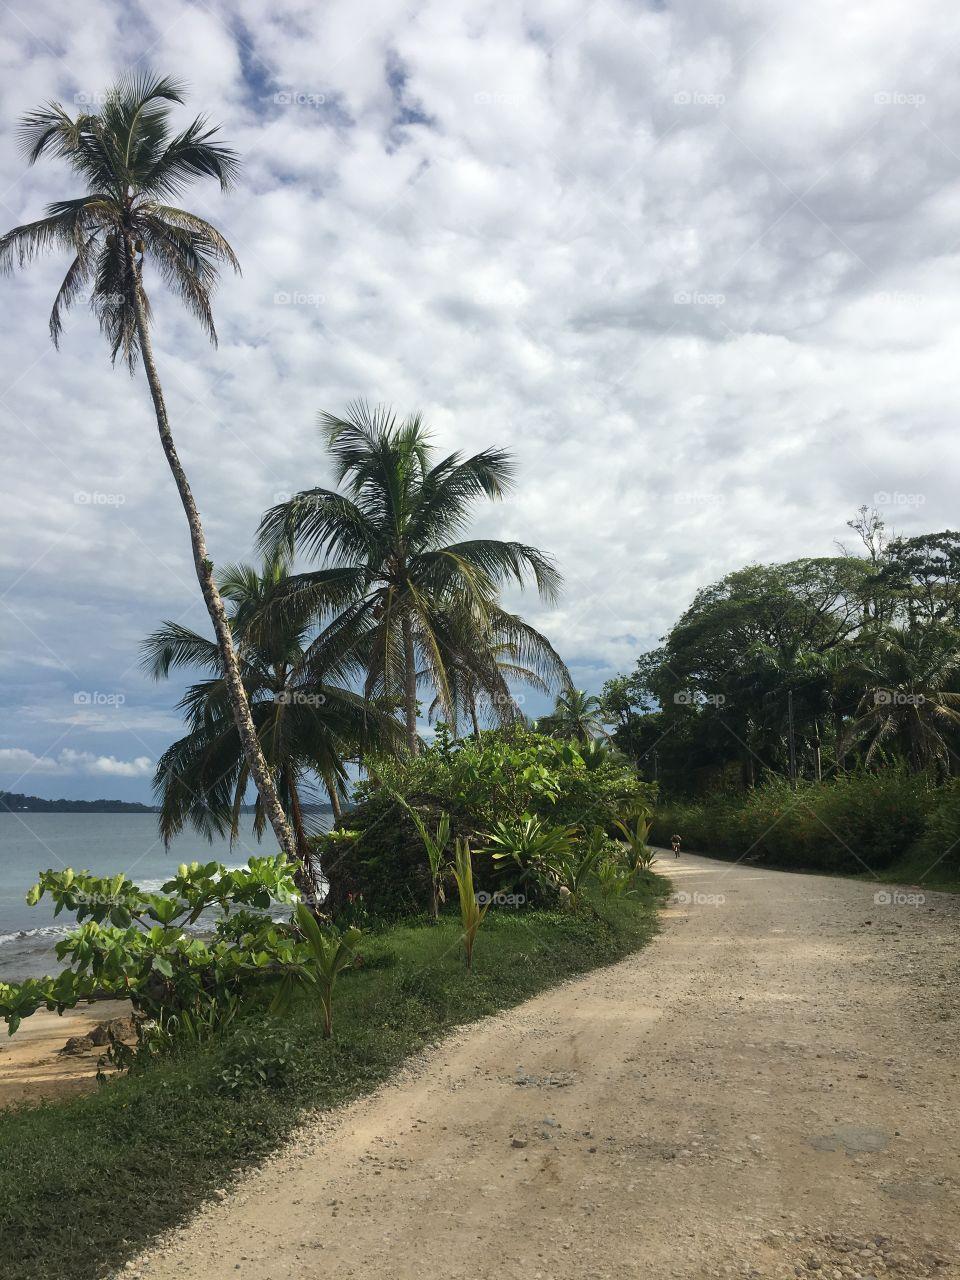 Panama is Awesome